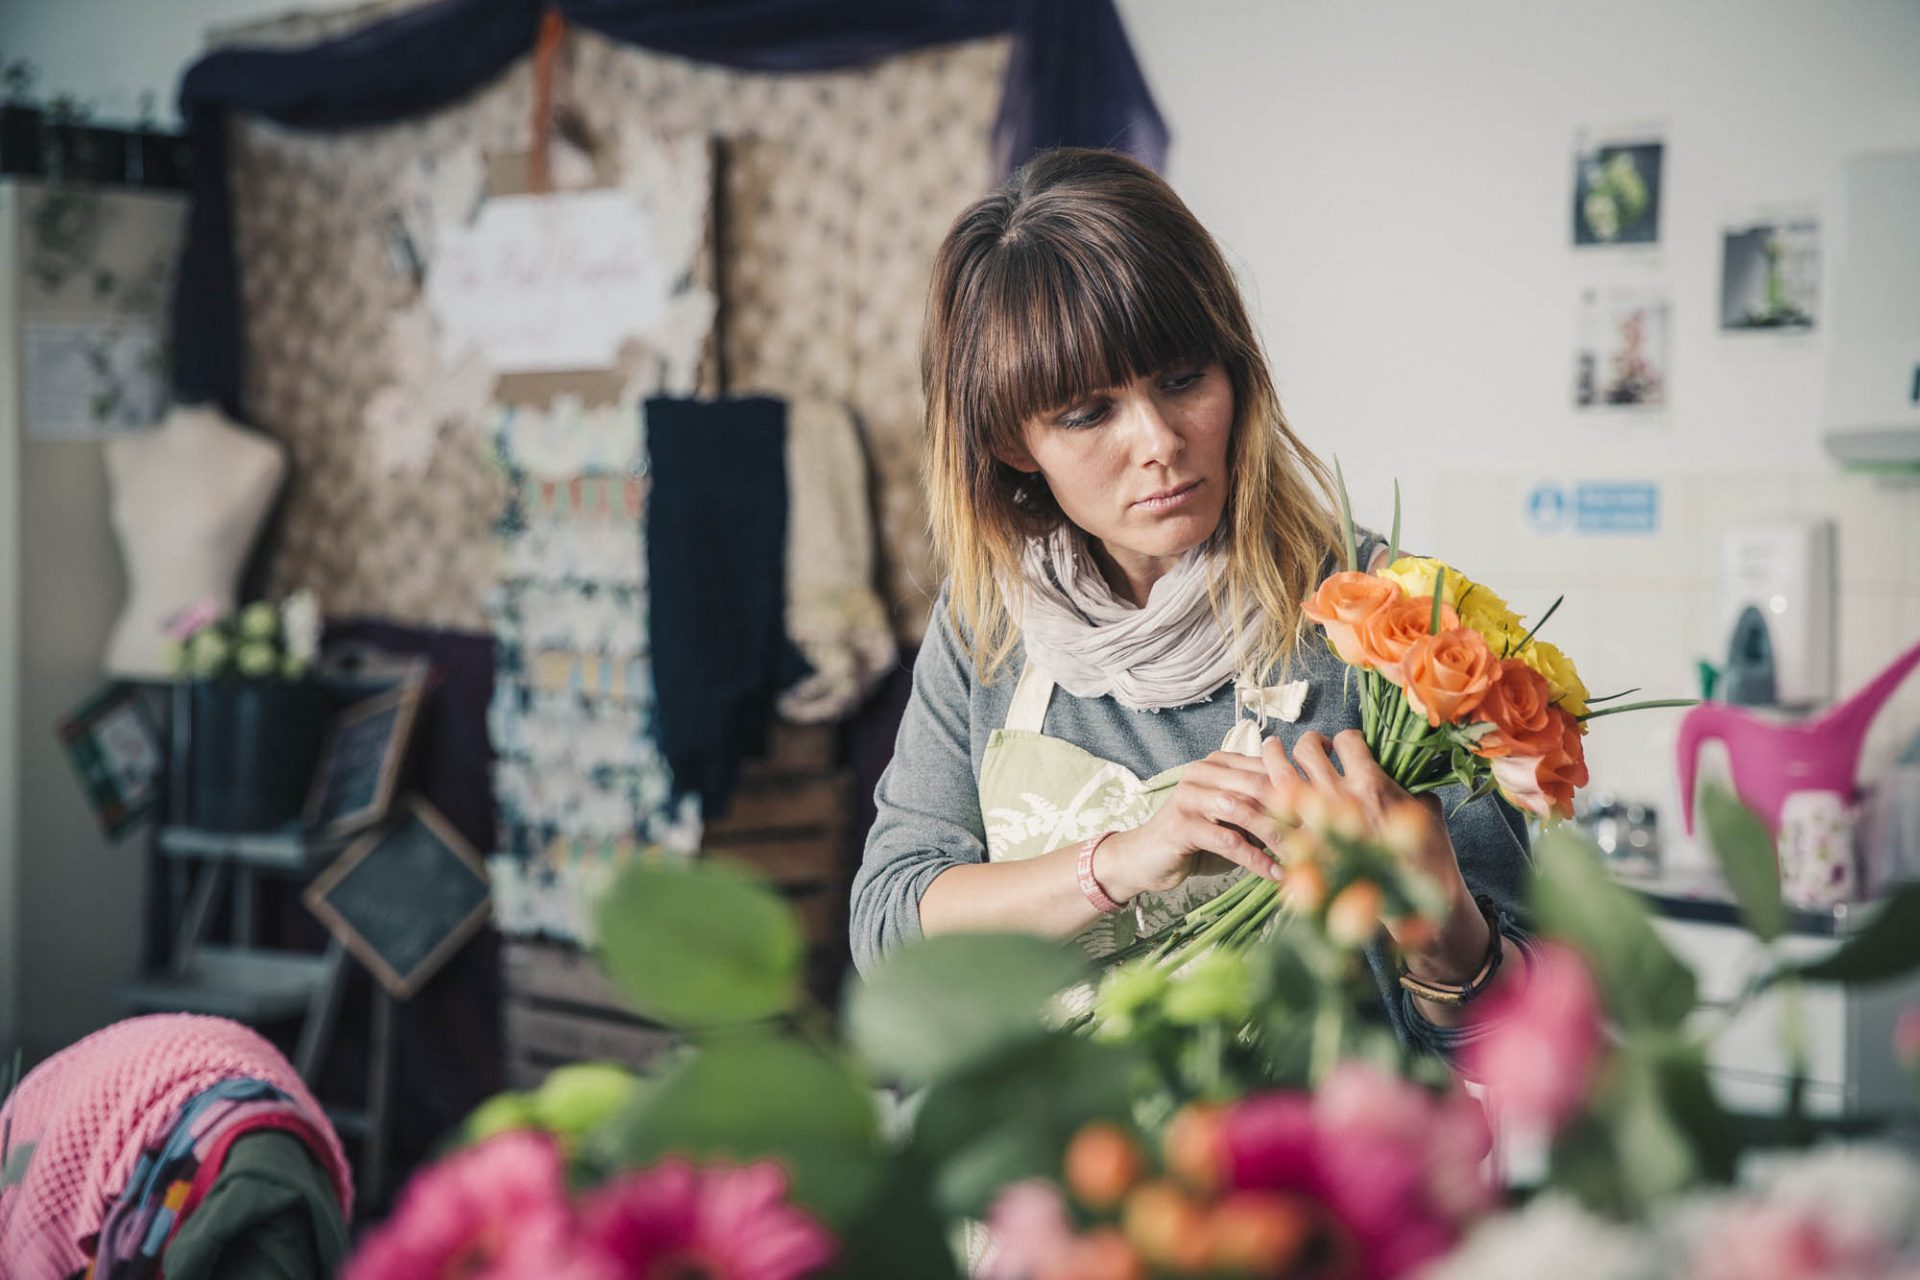 Floristry student, Miroslava Mihalickova arranges flowers